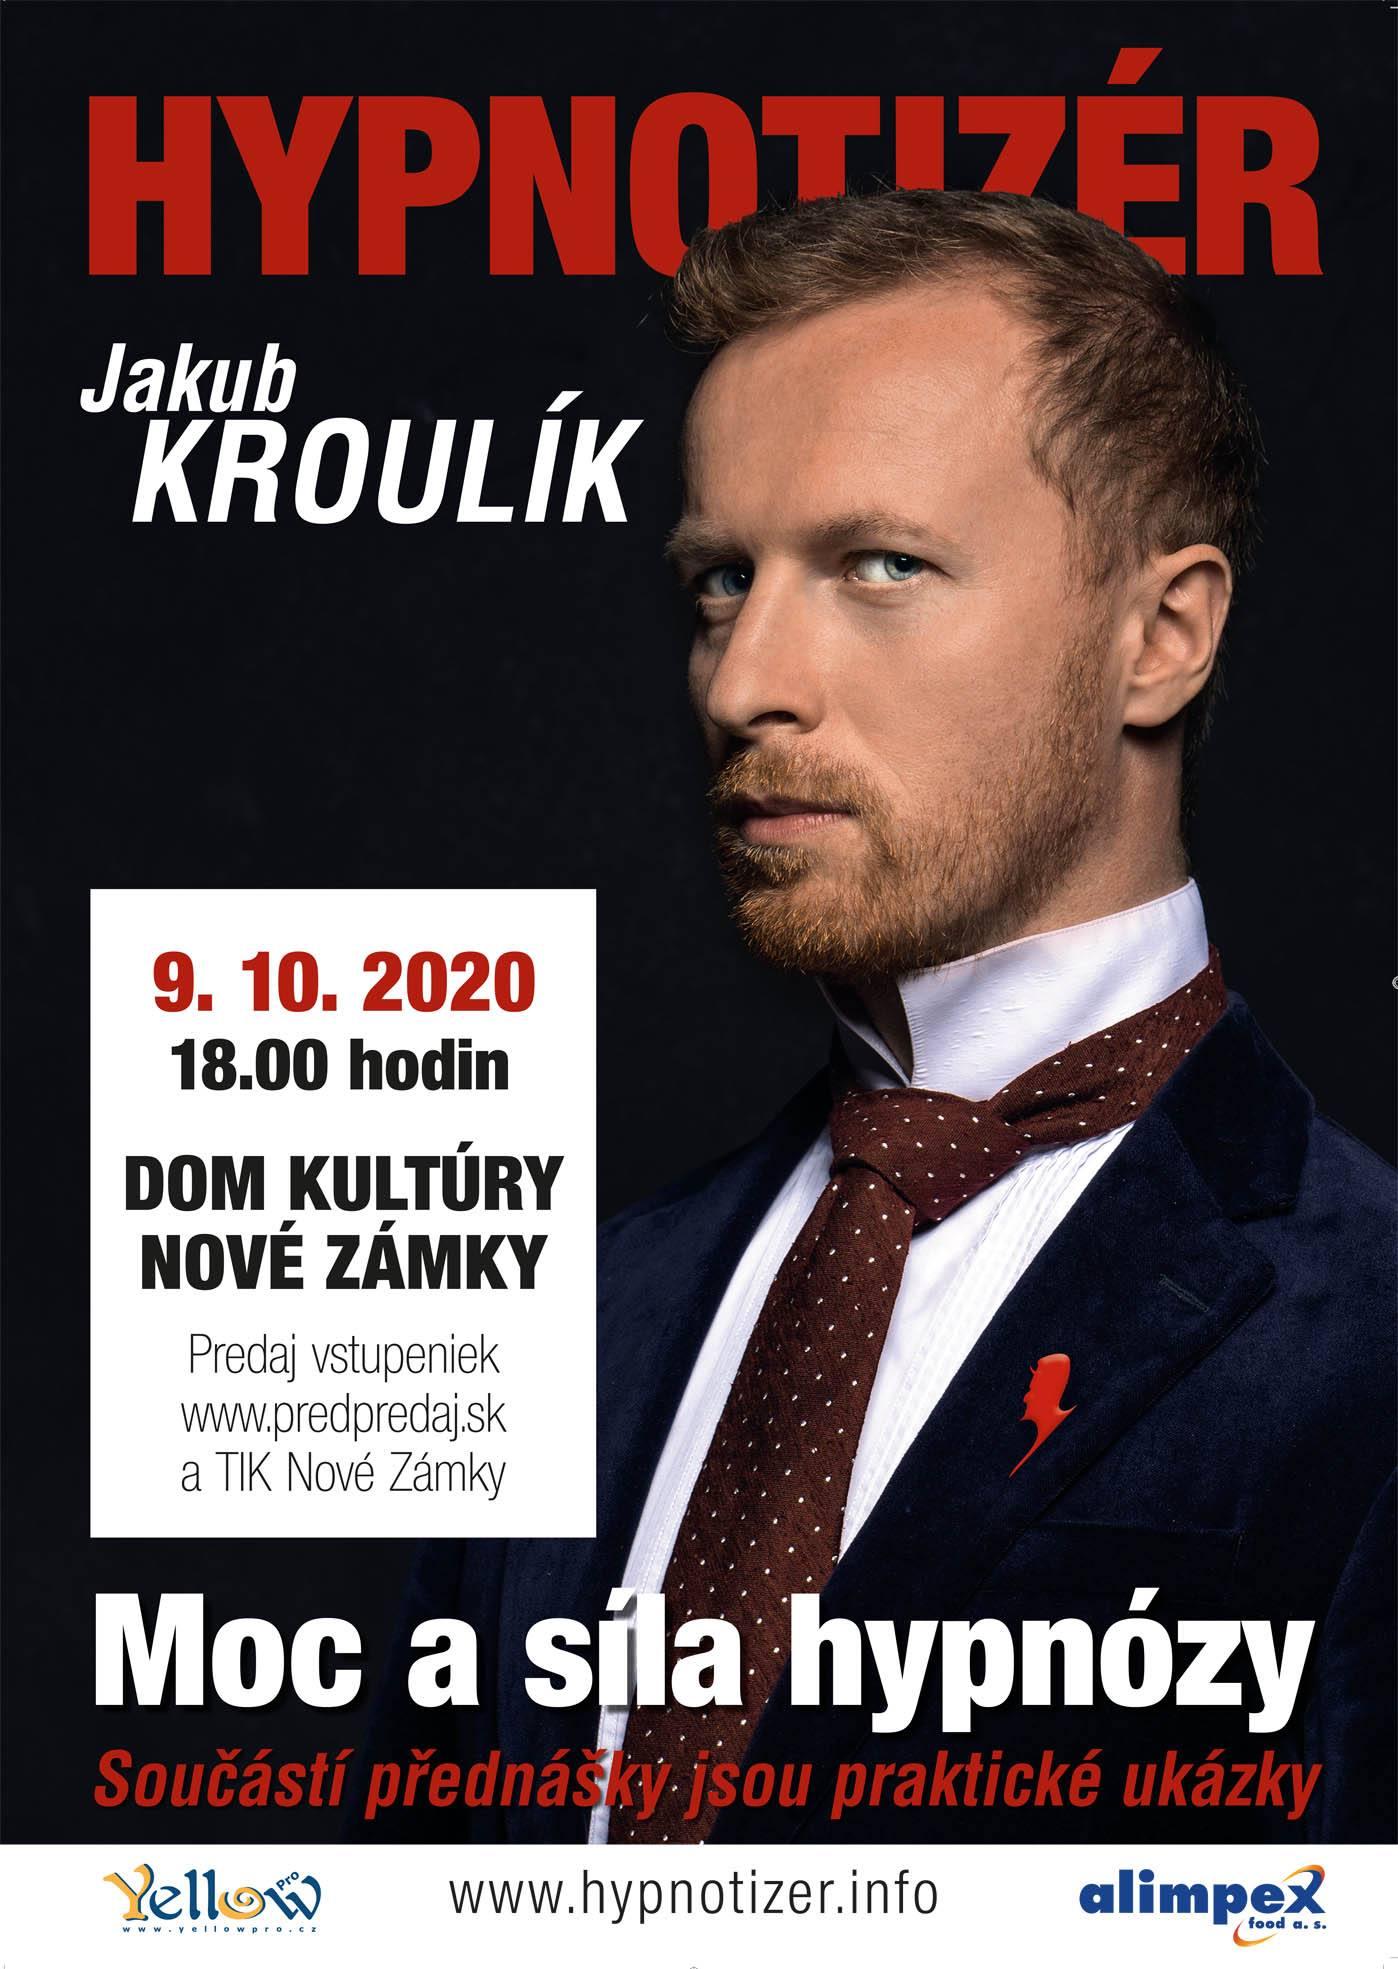 Hypnotizer Jakub Kroulik - Nove Zamky 2020